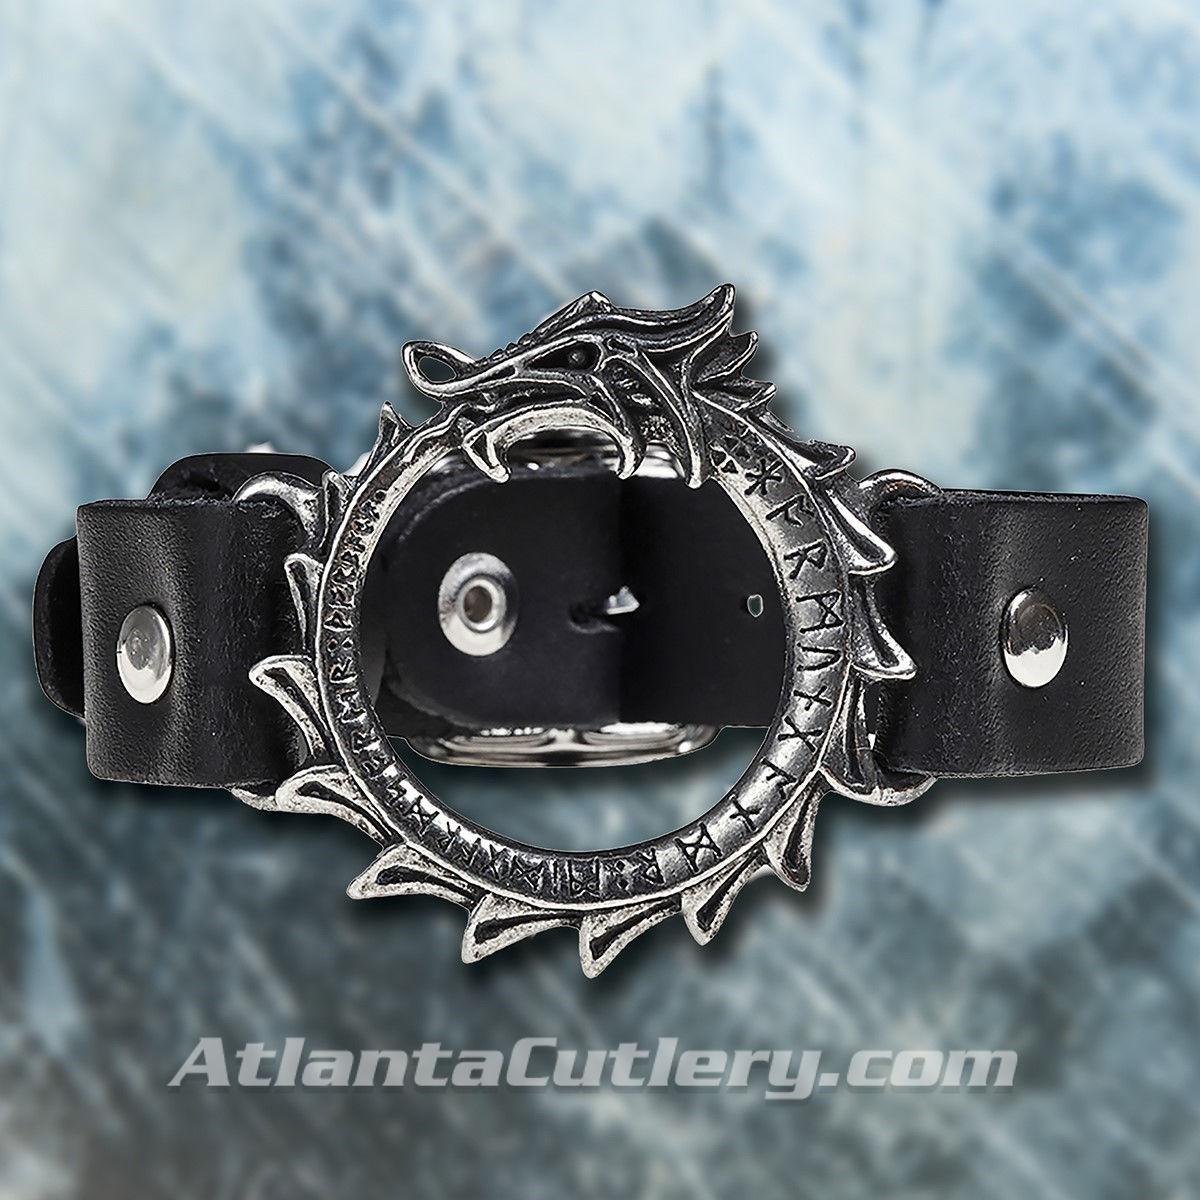 Picture of Jormungand Wrist Strap